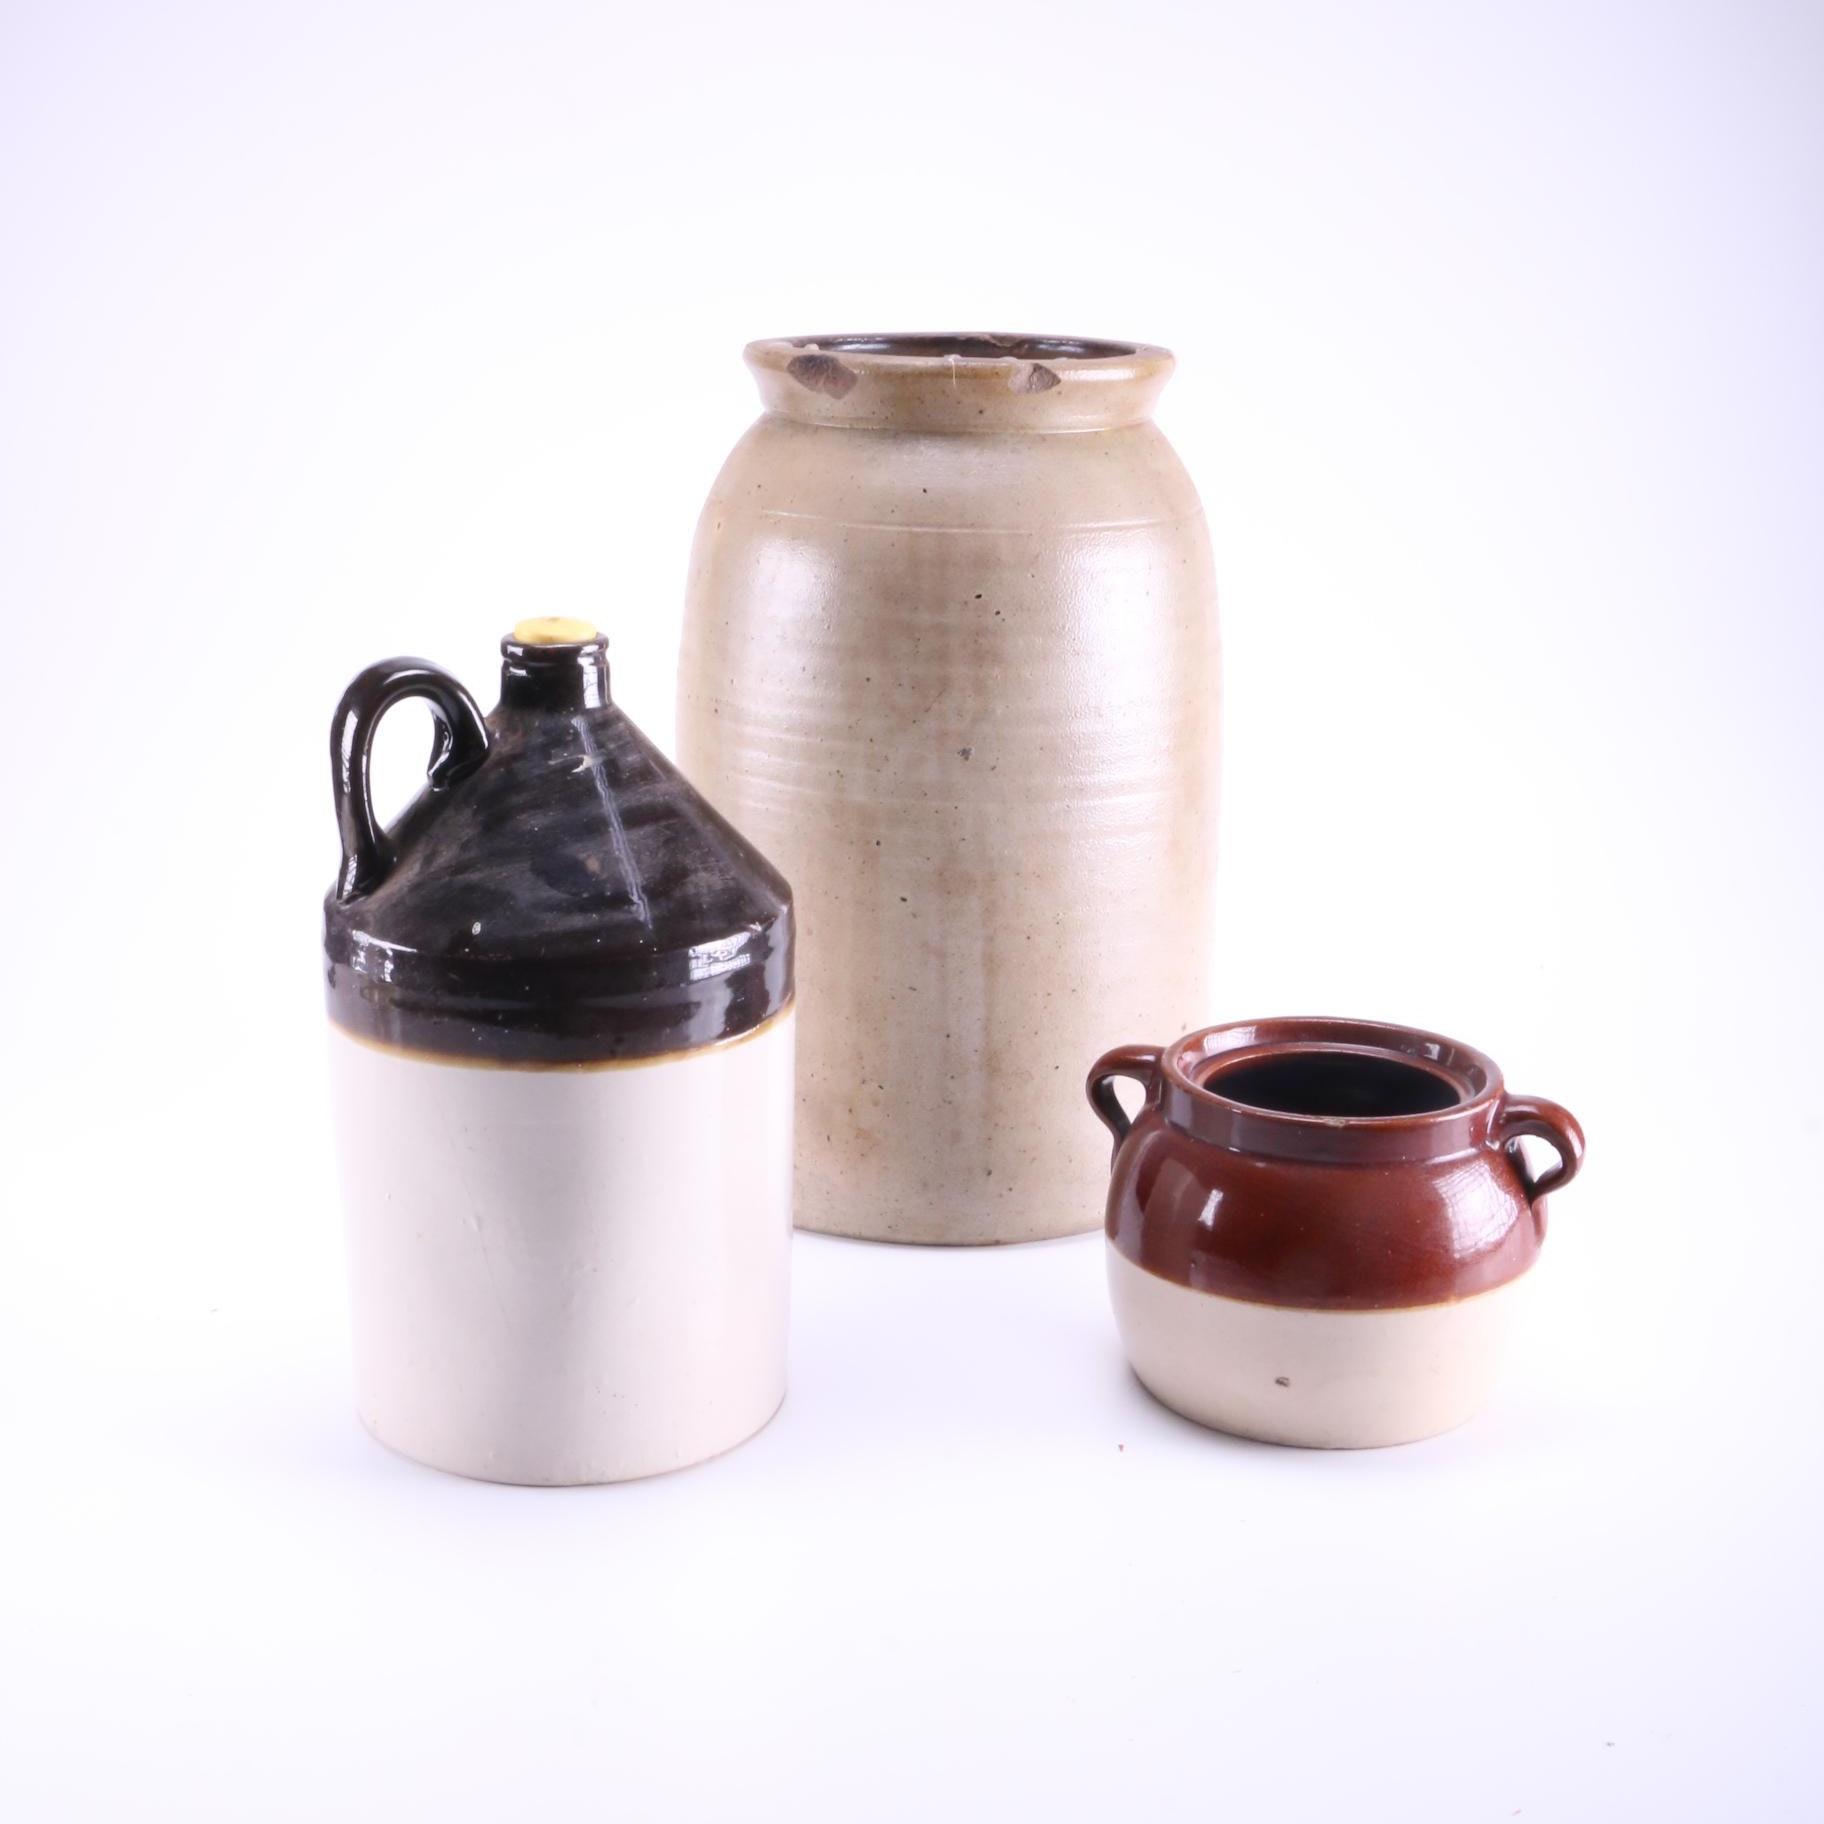 Assortment of Pottery Crocks and Jug